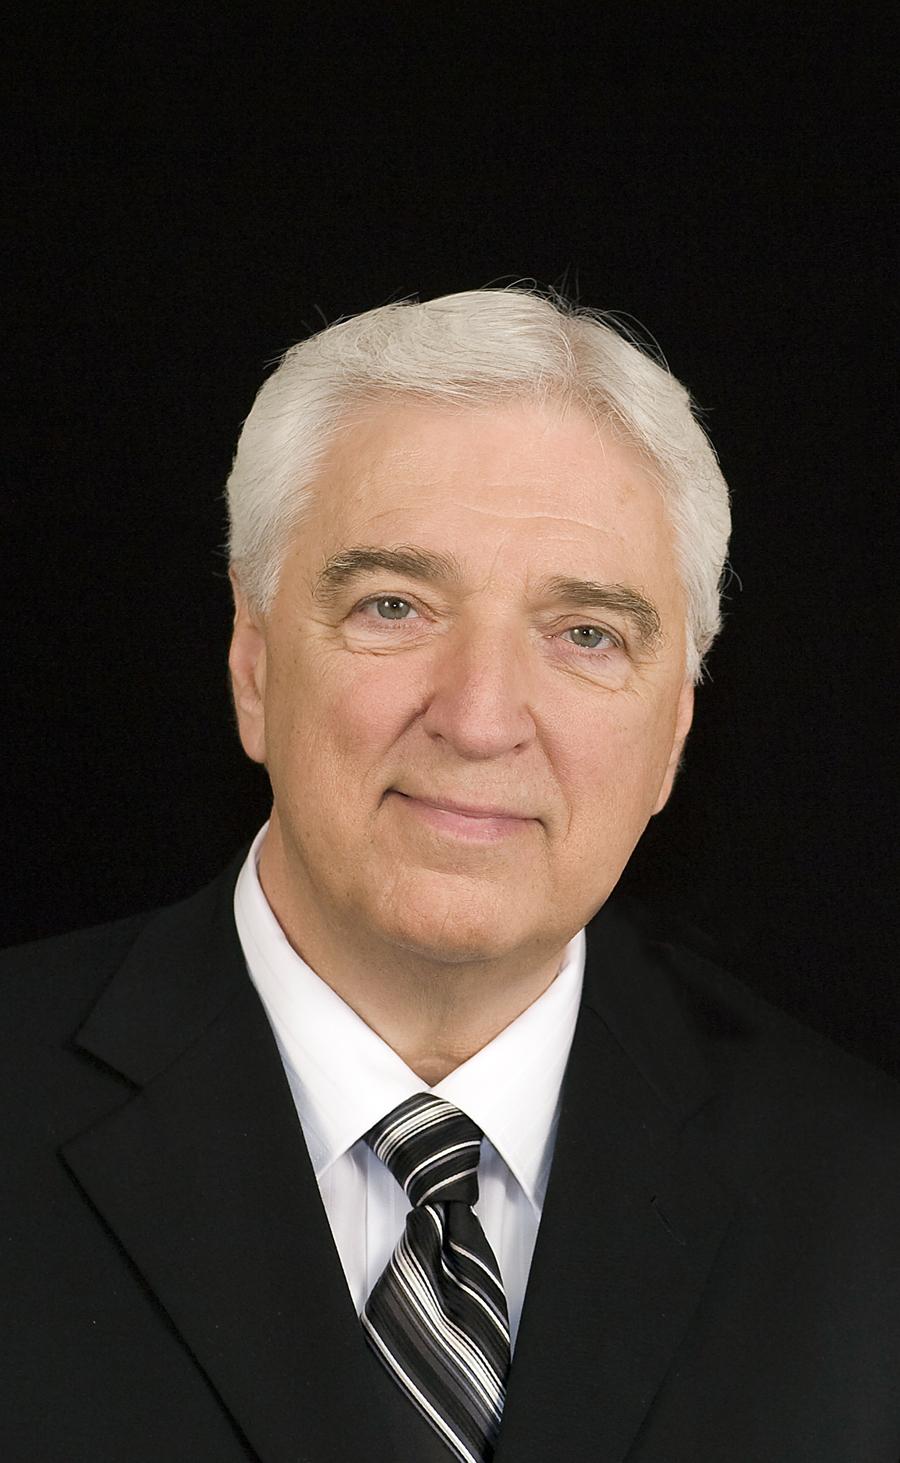 Pastor Frank Masserano